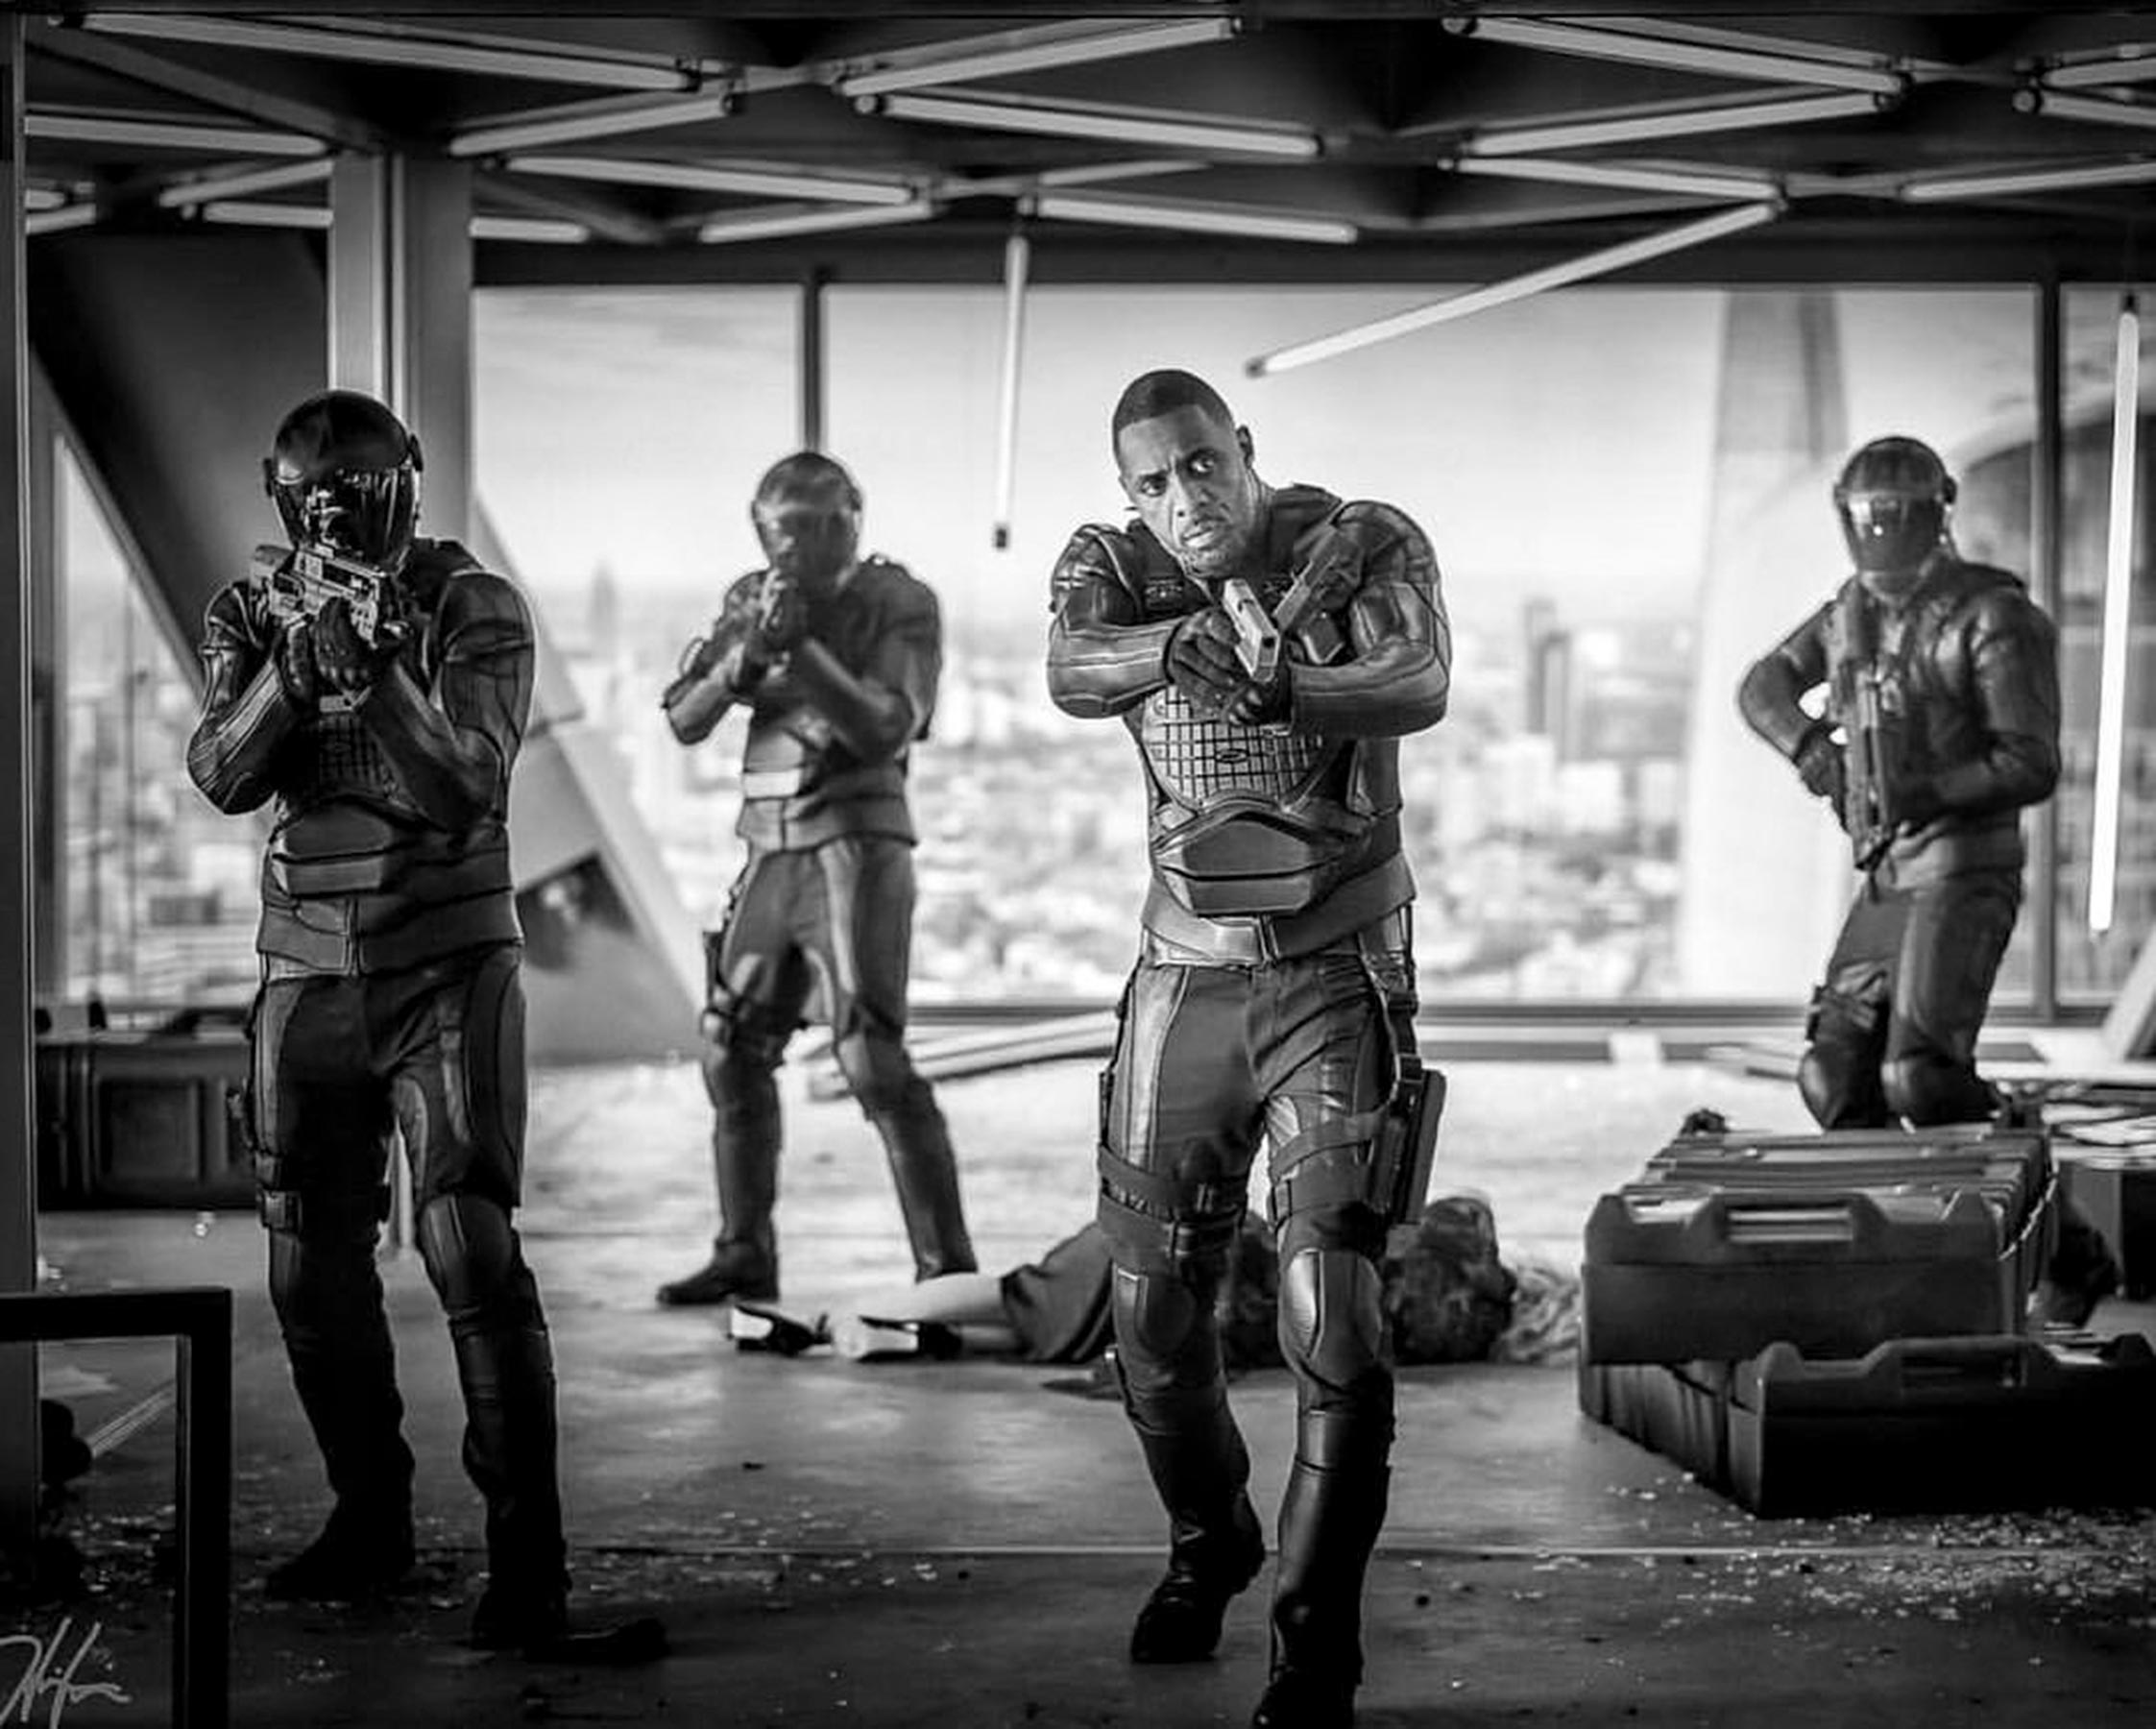 Jason Statham hypes up funnier-than-expected <em>Hobbs & Shaw</em>, Idris Elbas electric villain 6